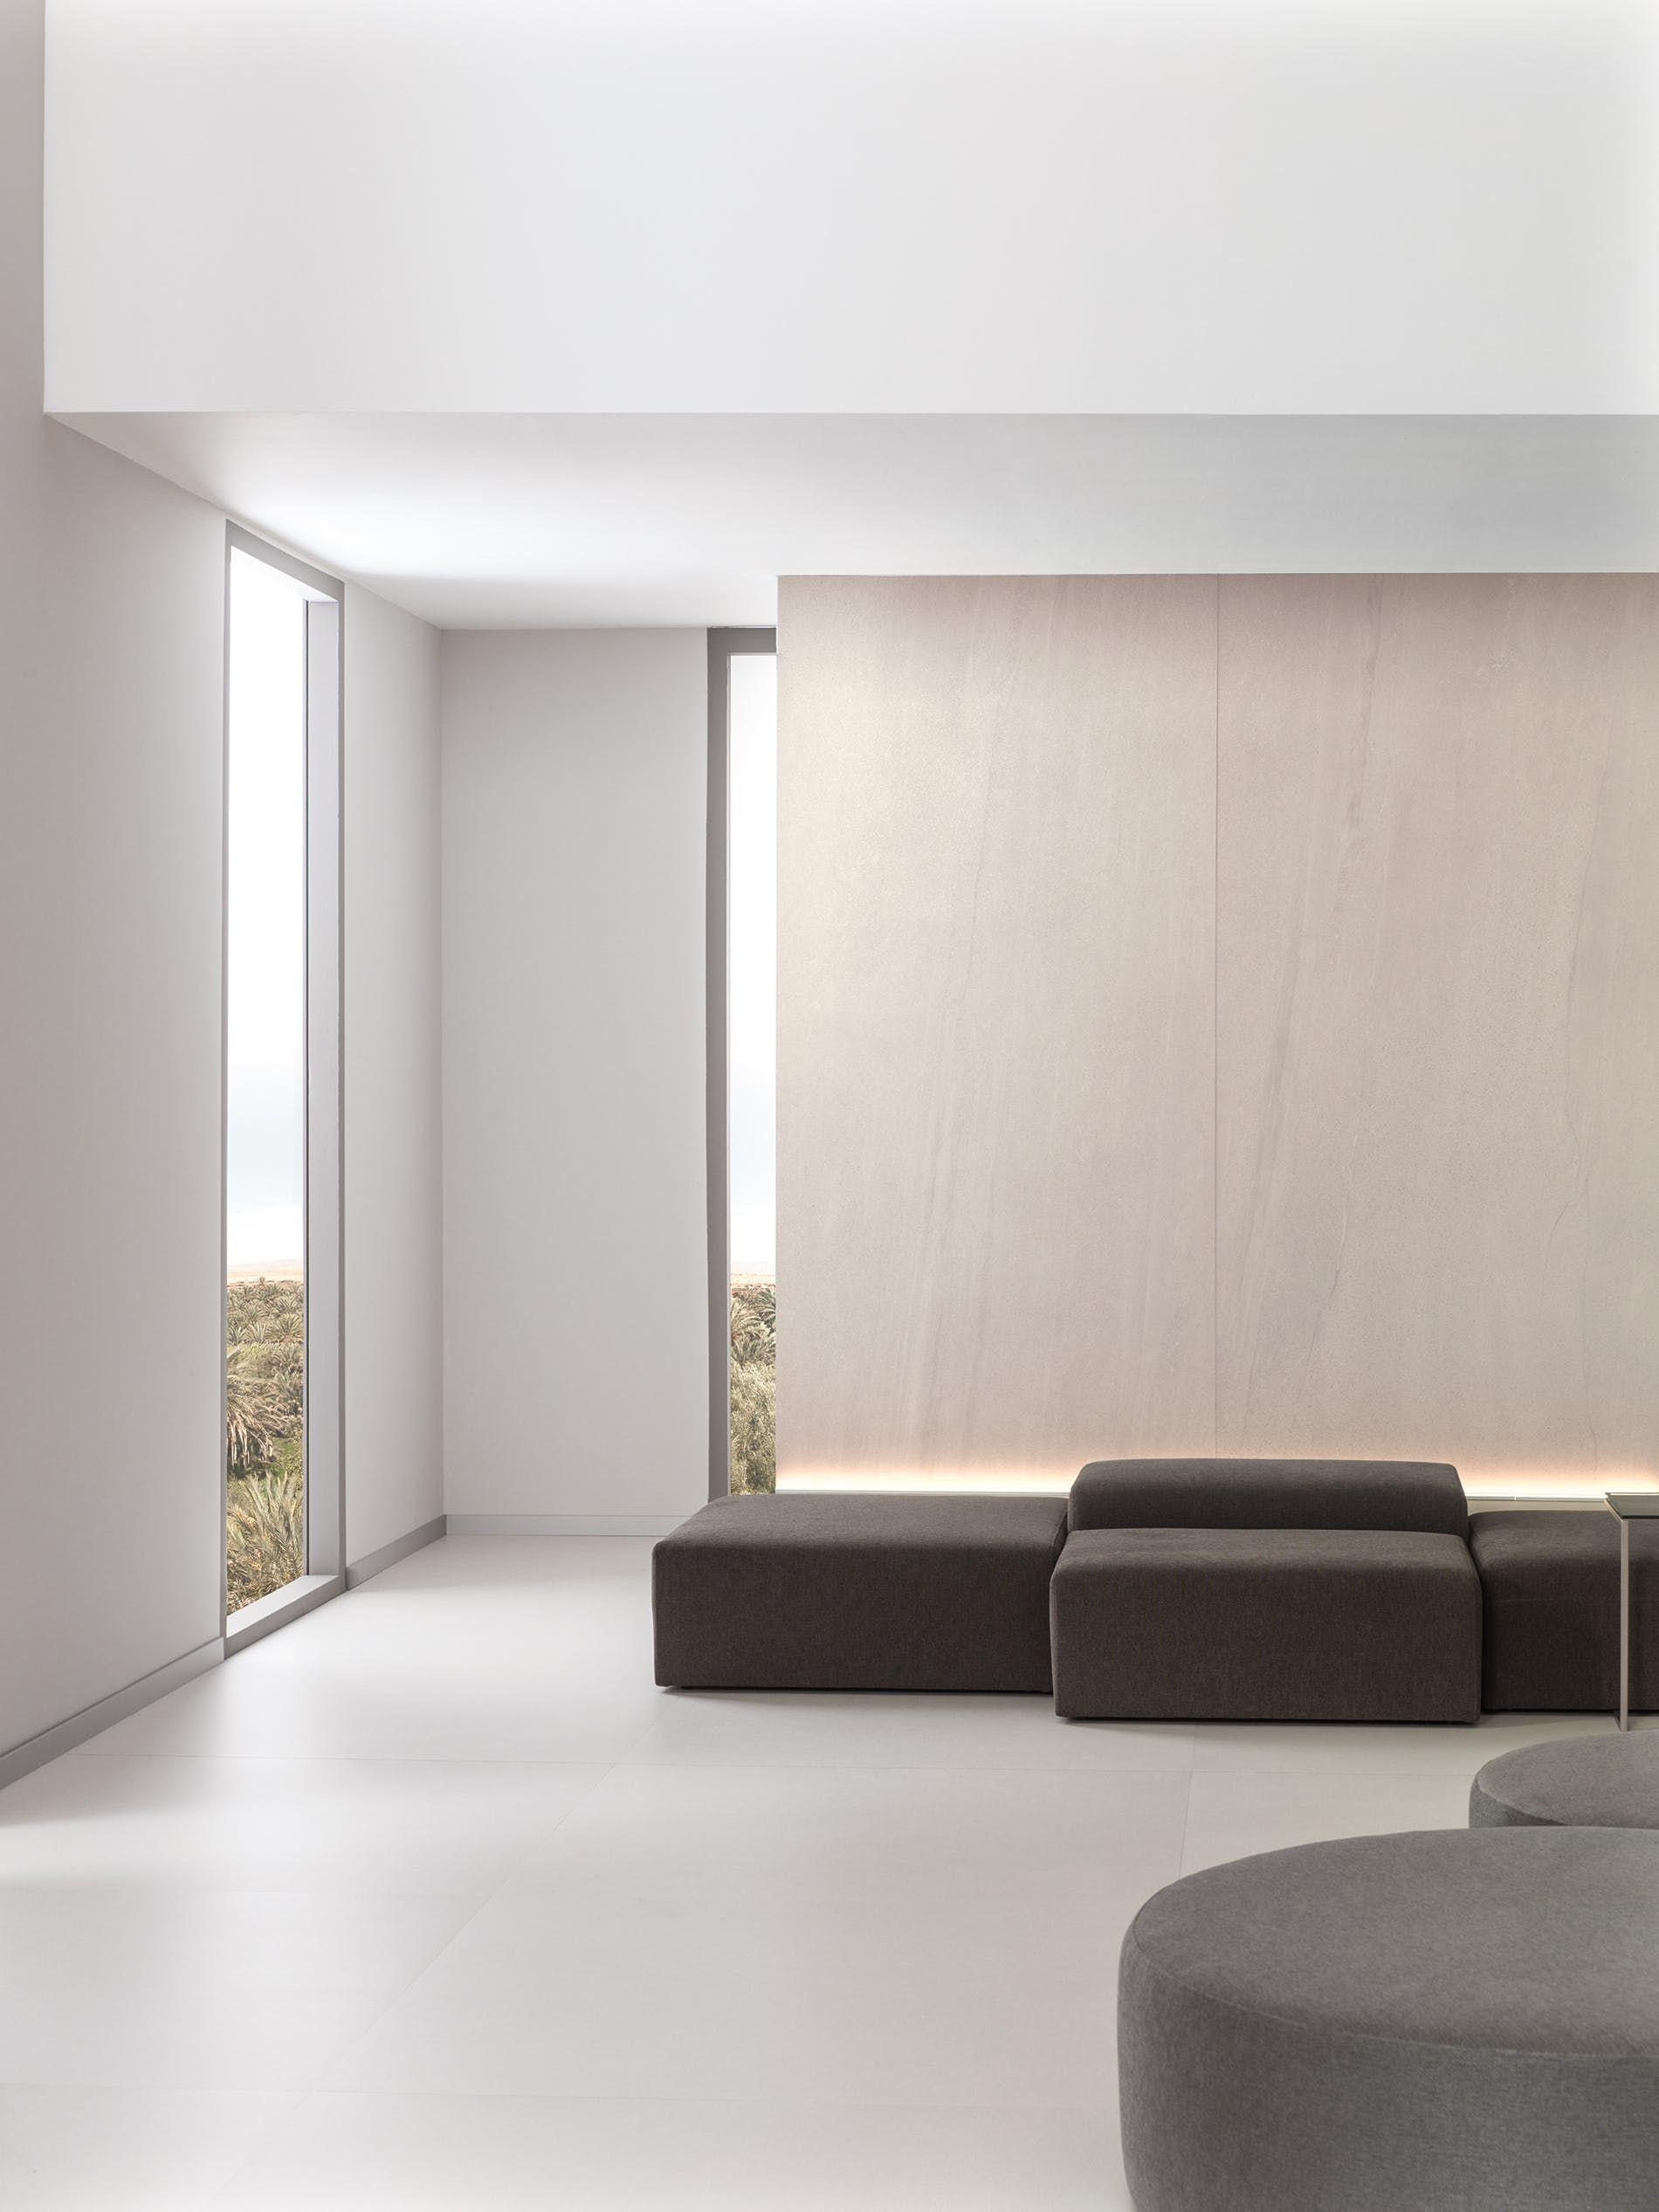 XLIGHT AGED CLAY by URBATEK - PORCELANOSA Grupo | Archello